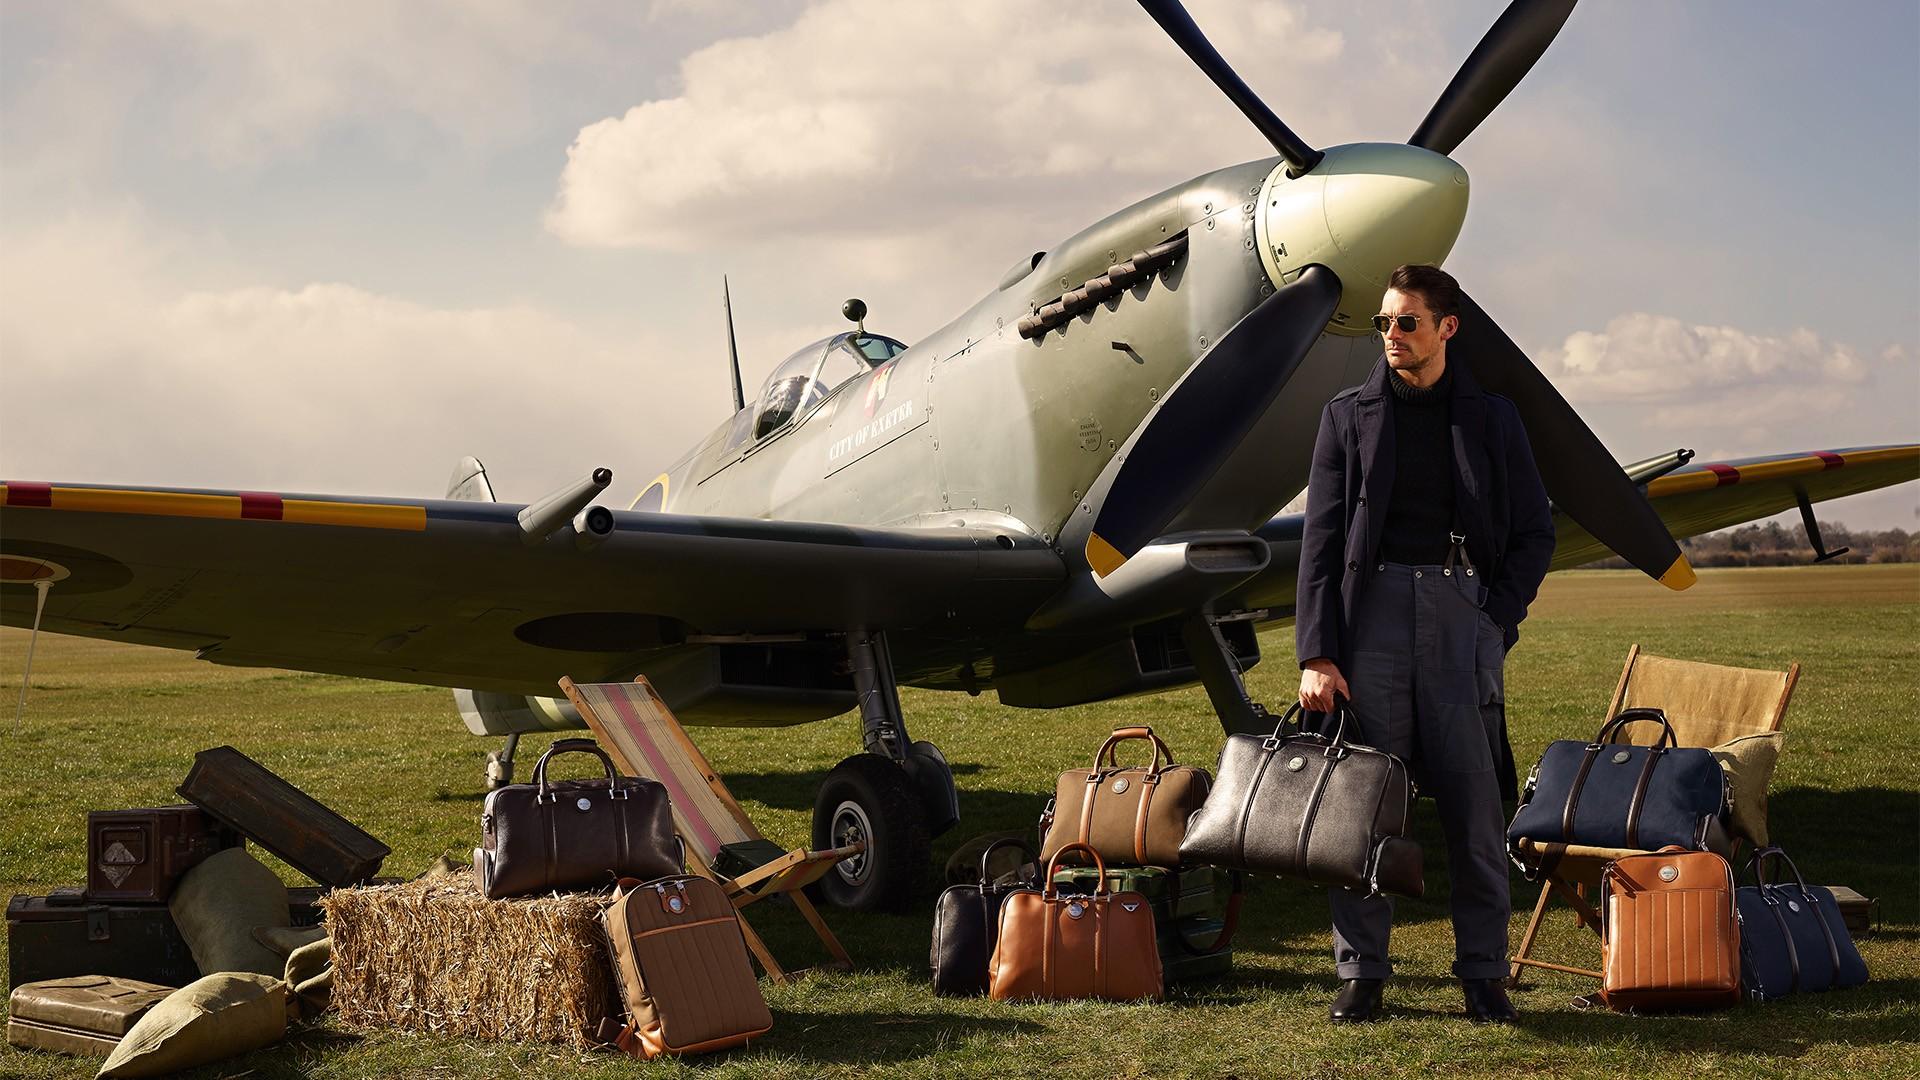 David Gandy: The Aerodrome Collection